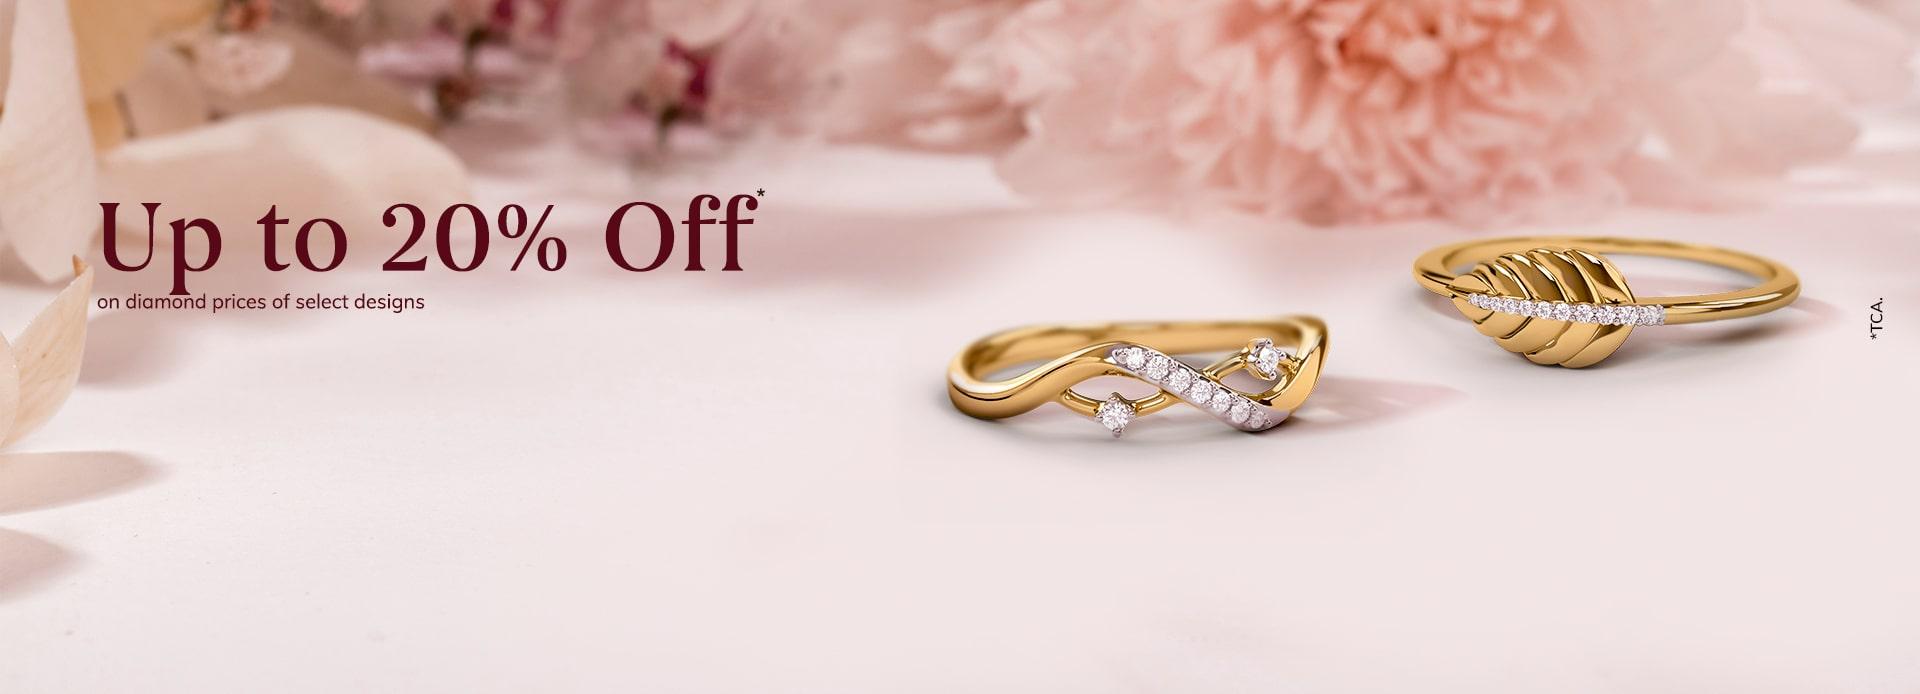 Up to 20% off on diamond prices